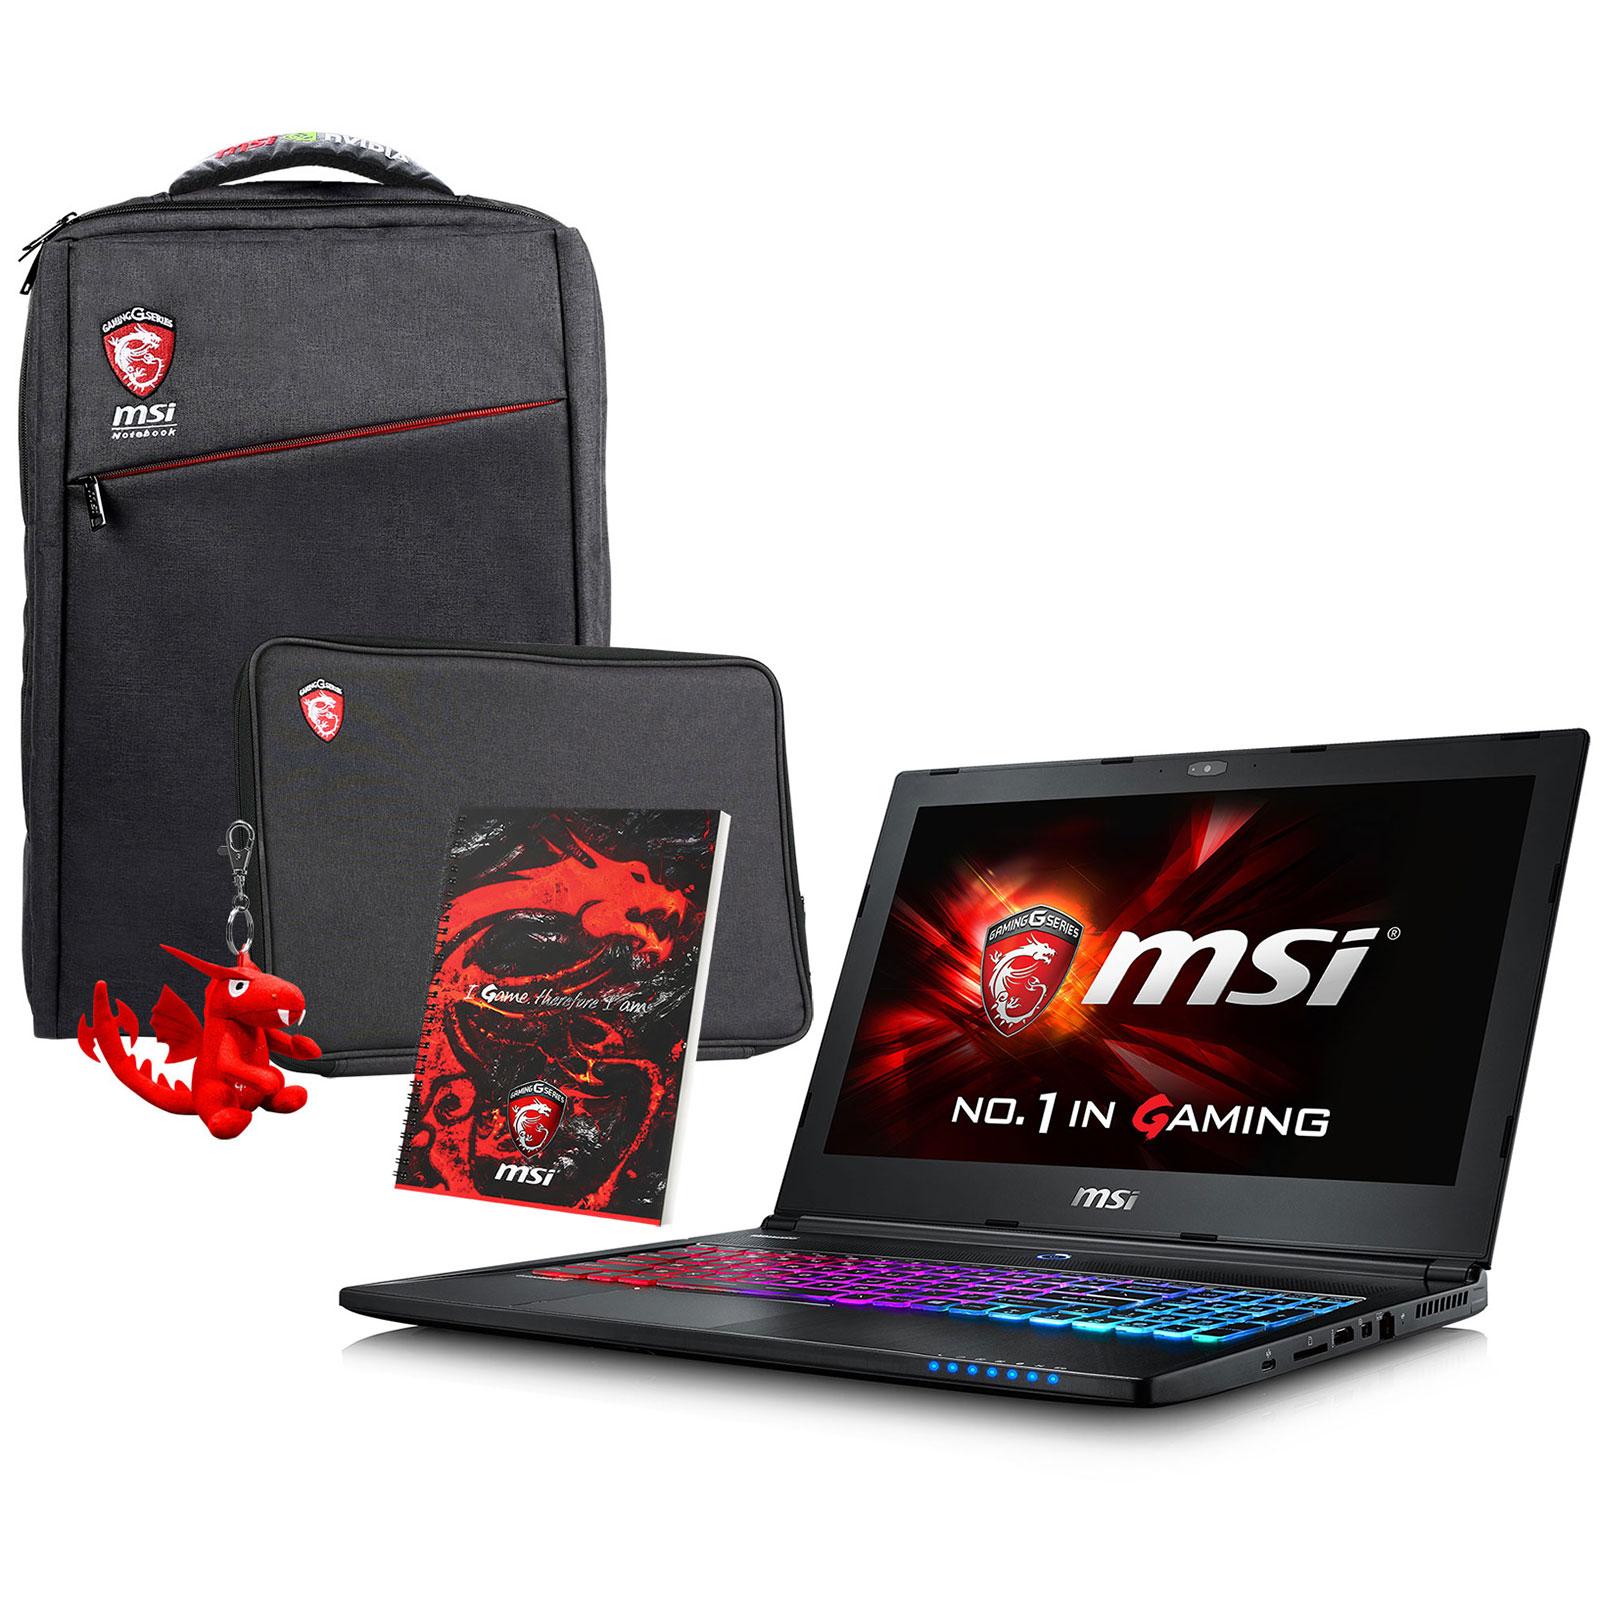 PC portable MSI GS60 6QD-288FR Ghost Pro + Pack Spécial Printemps OFFERT !  Intel fa2ad7e9dcd2